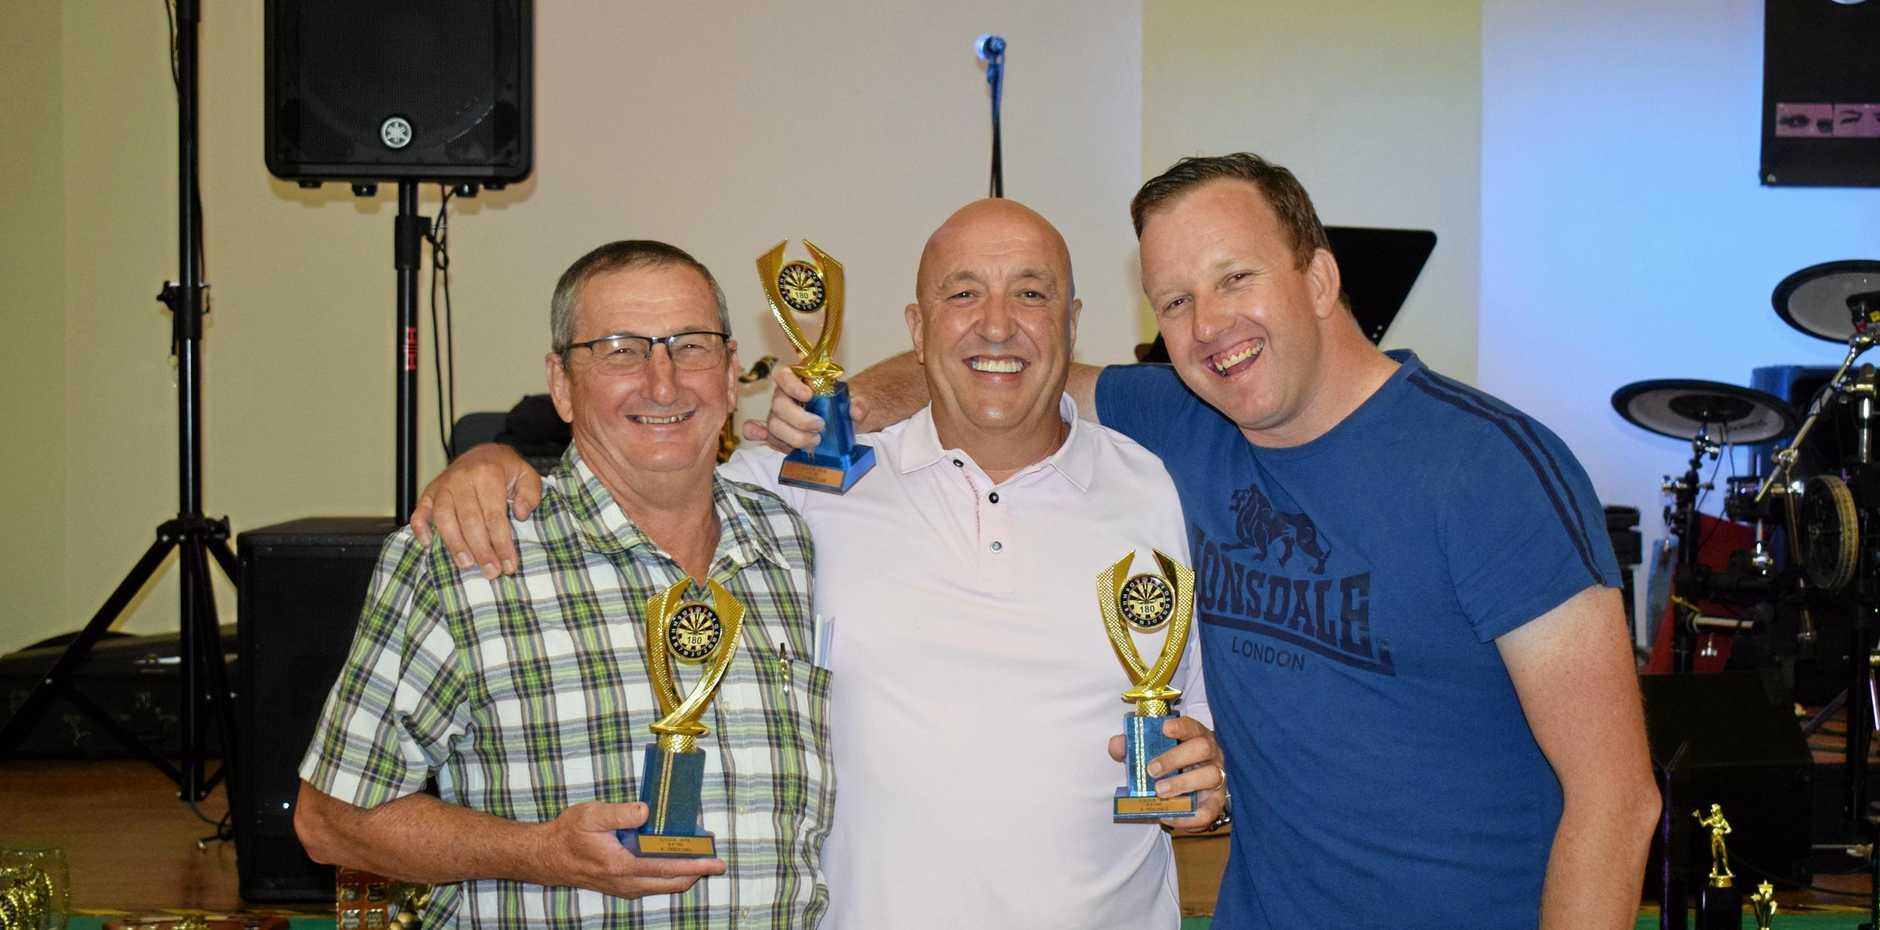 AWARDS NIGHT: - 4x180 winners (From Left) Kerry Treichel, Steve Hughes and Dean Chandler